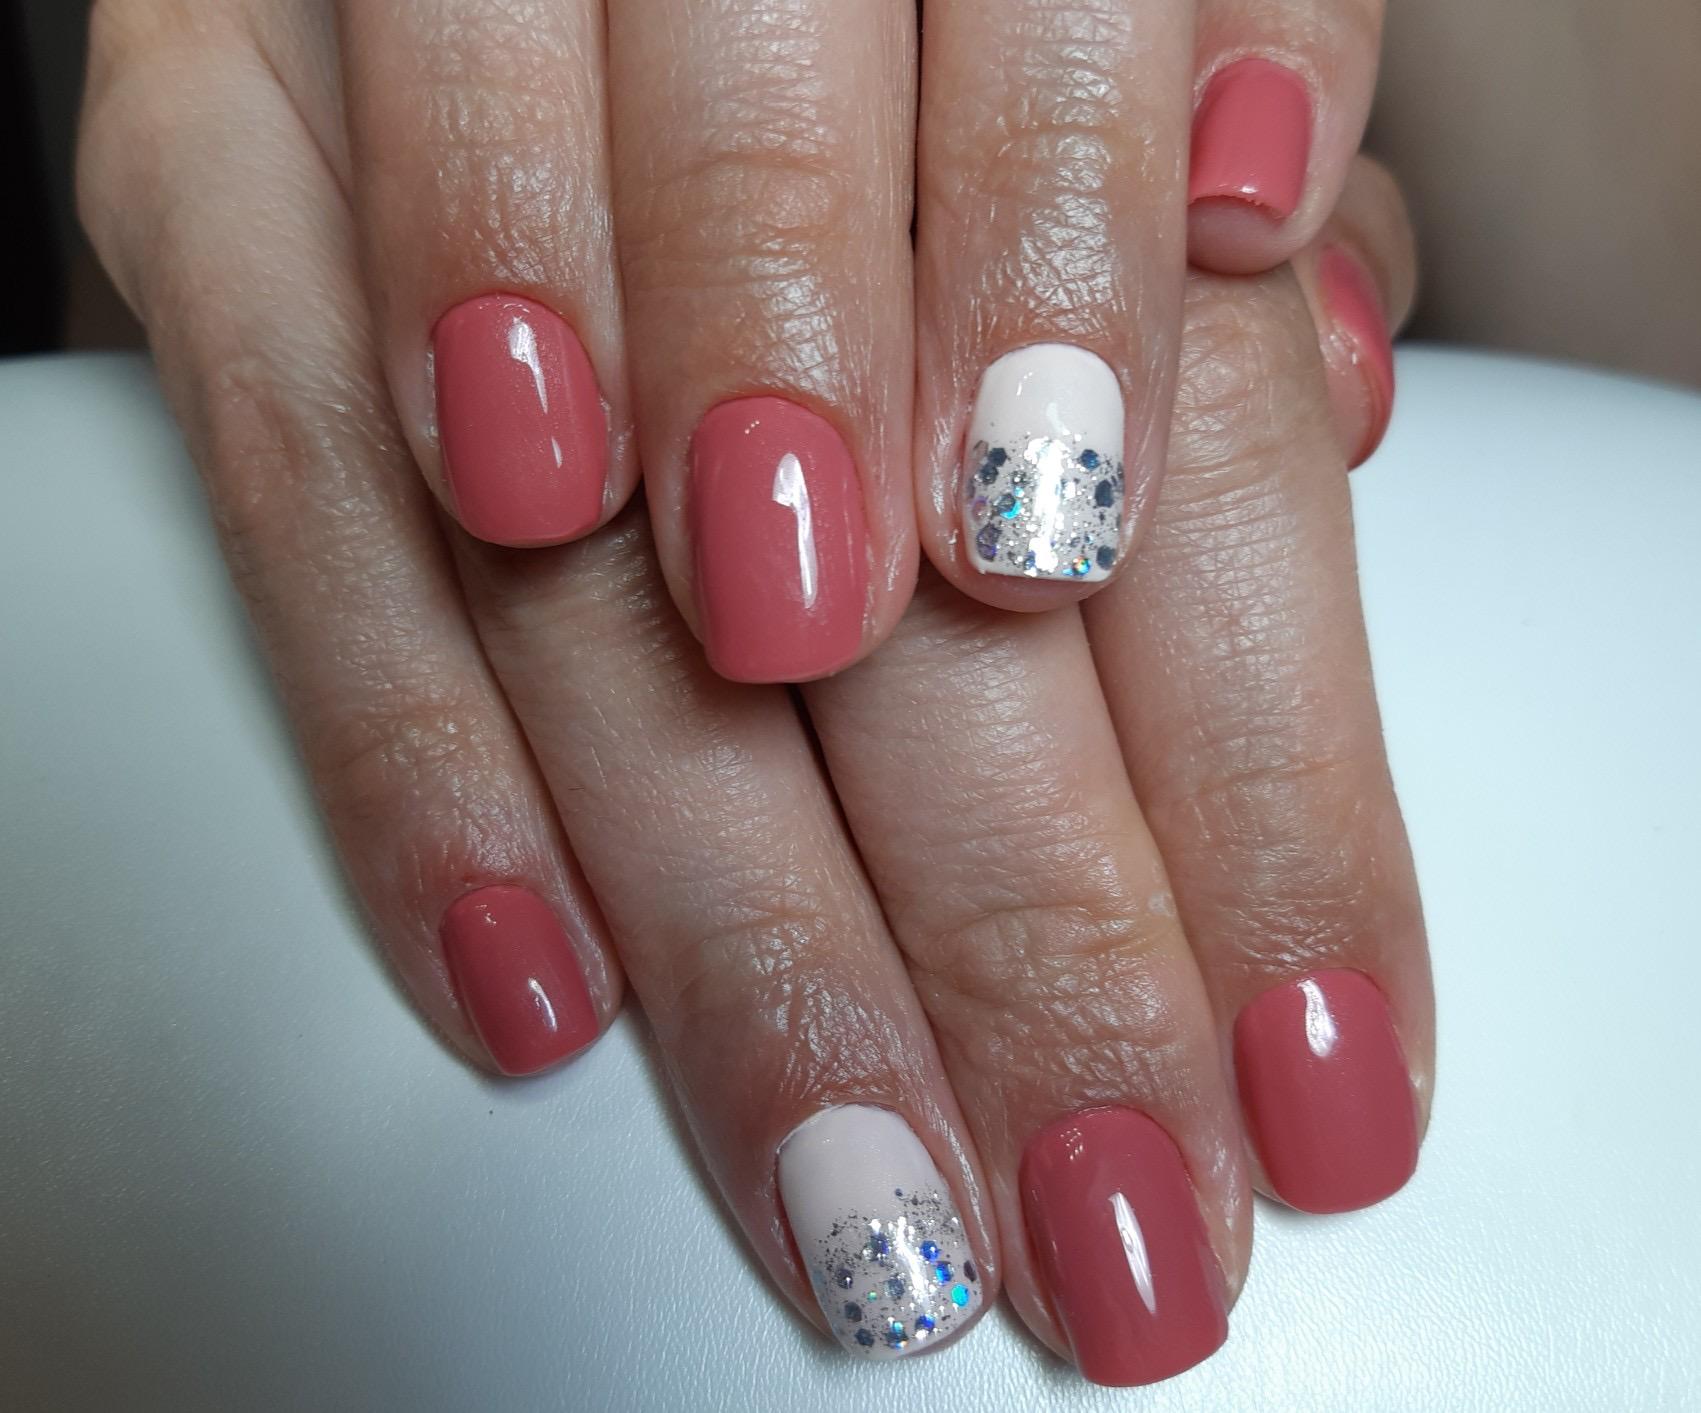 Маникюр с камифубуки в розовом цвете на короткие ногти.